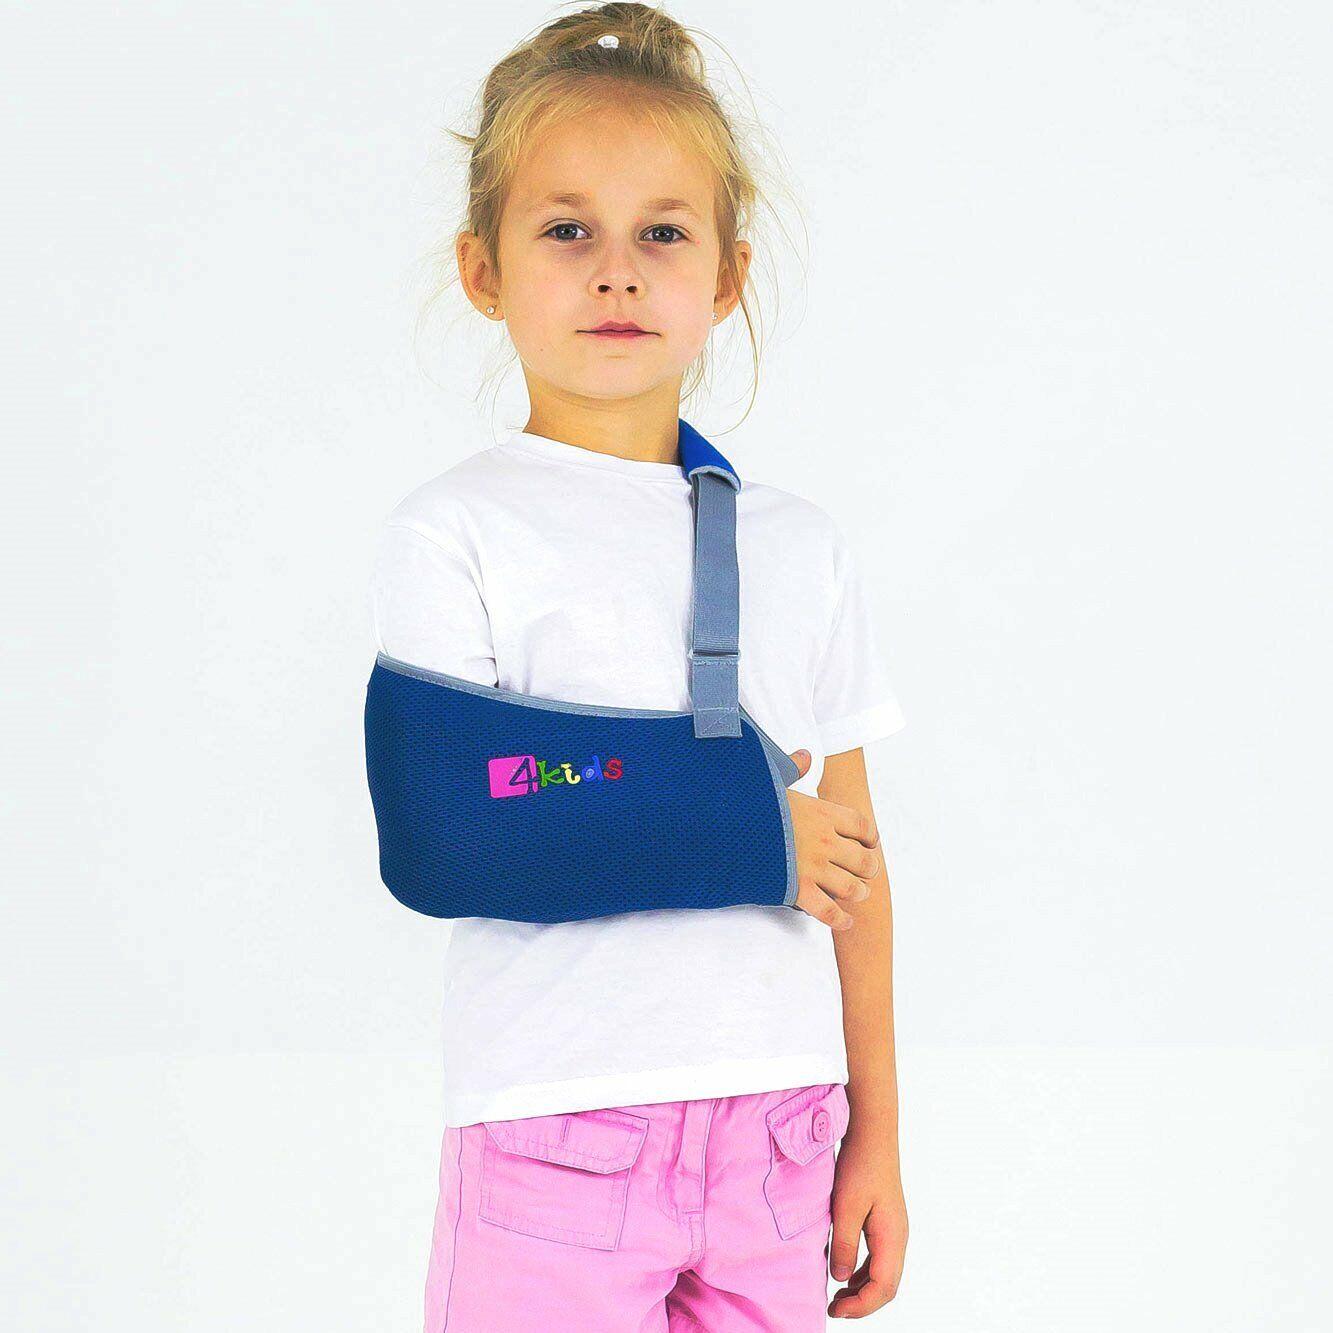 Armschlinge Armtragegurt Armbandage Gipsverband Armorthese für Kind